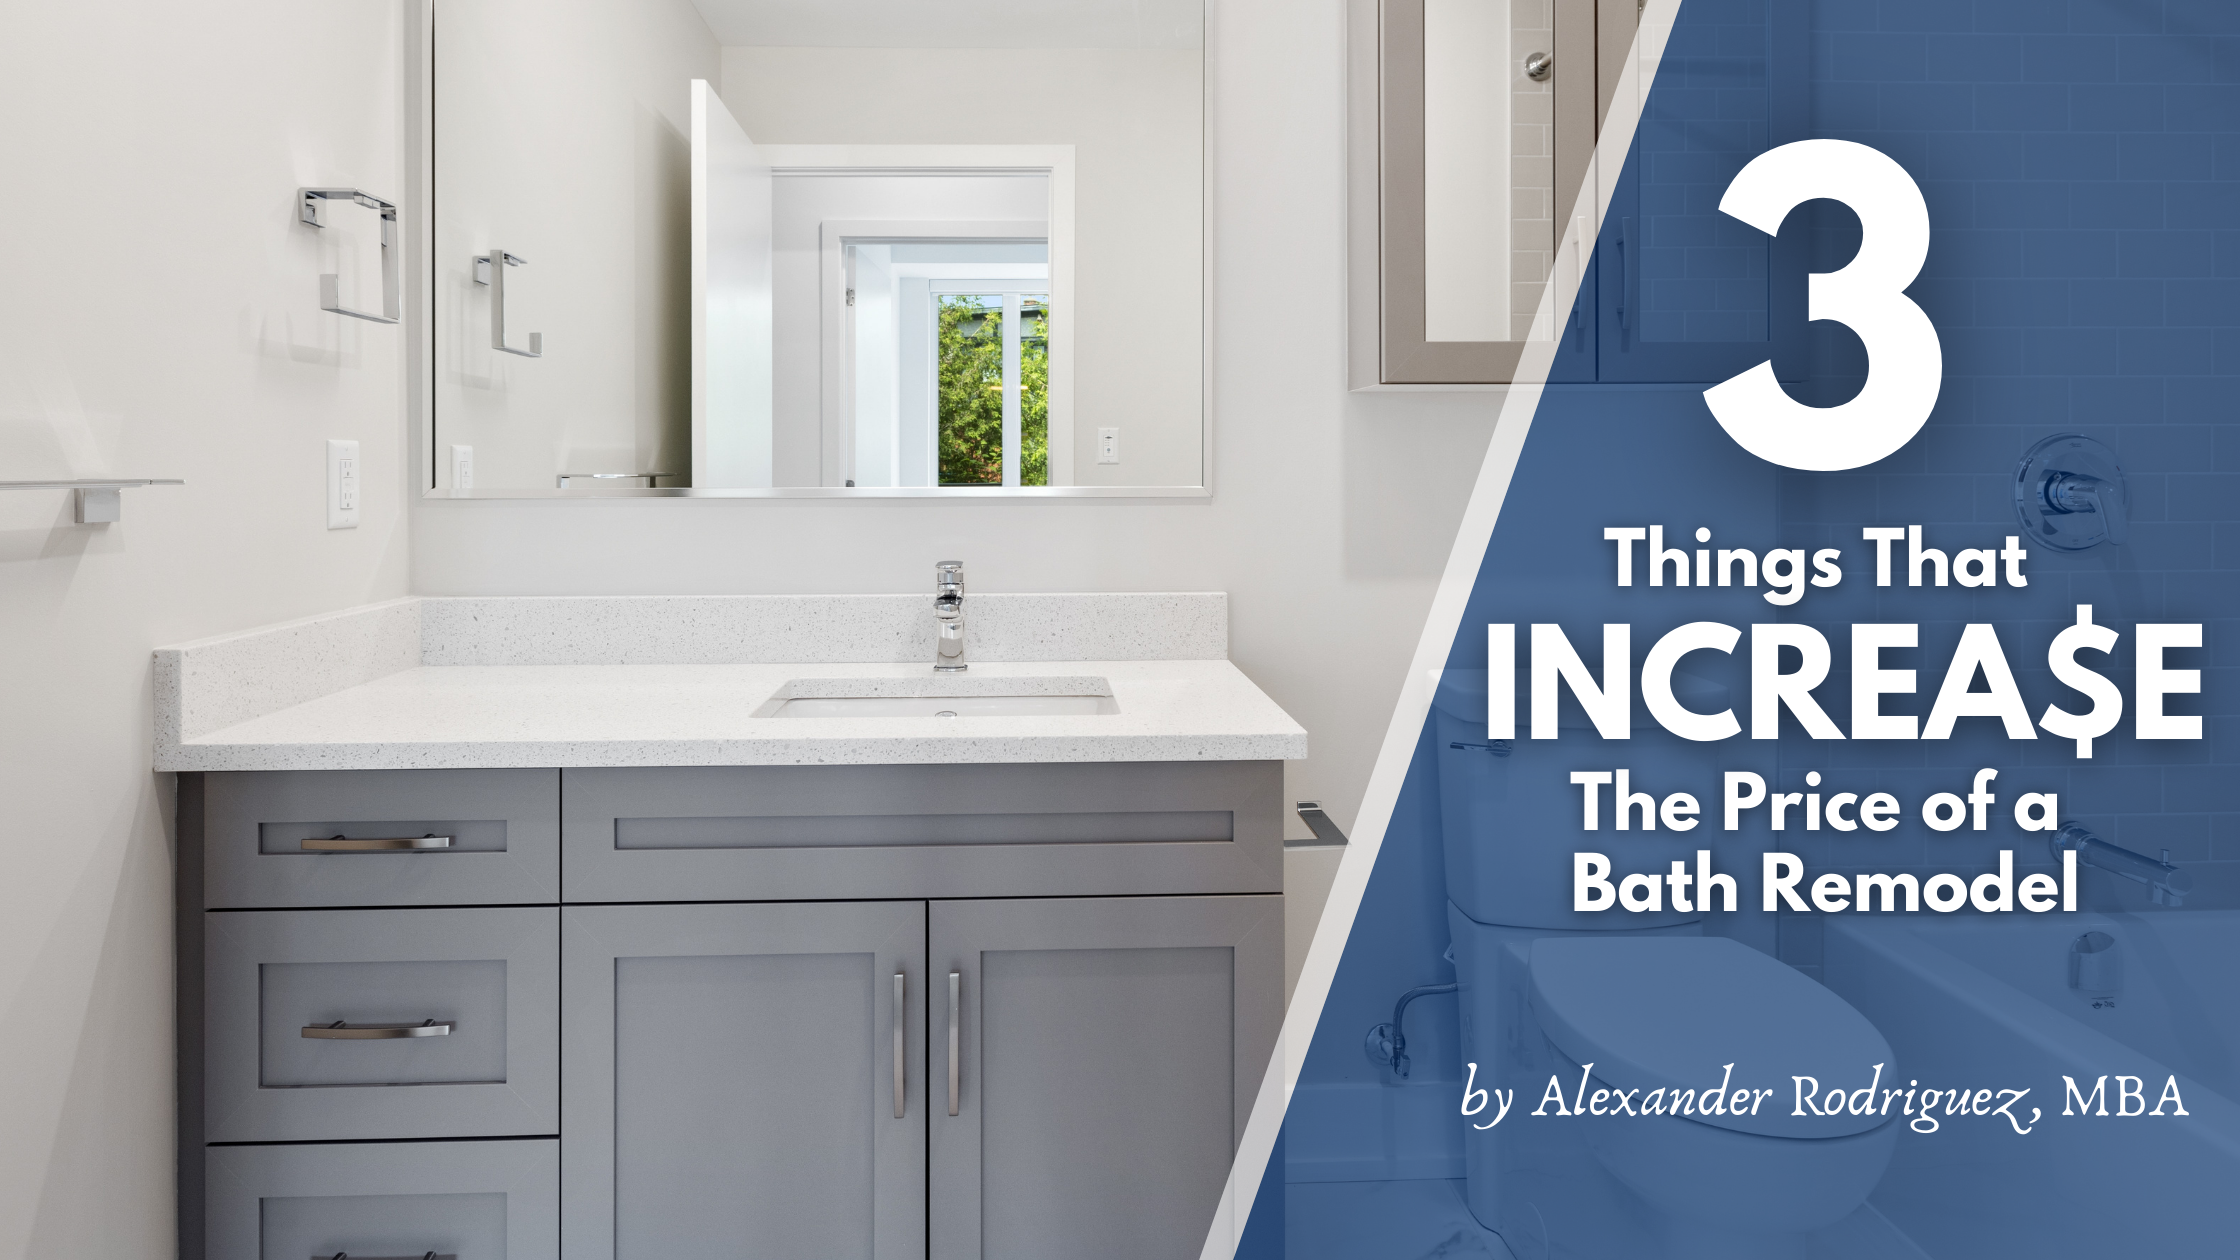 Bathroom Remodeling Costs - 3 Things that Increase the Price of Bathroom Remodels